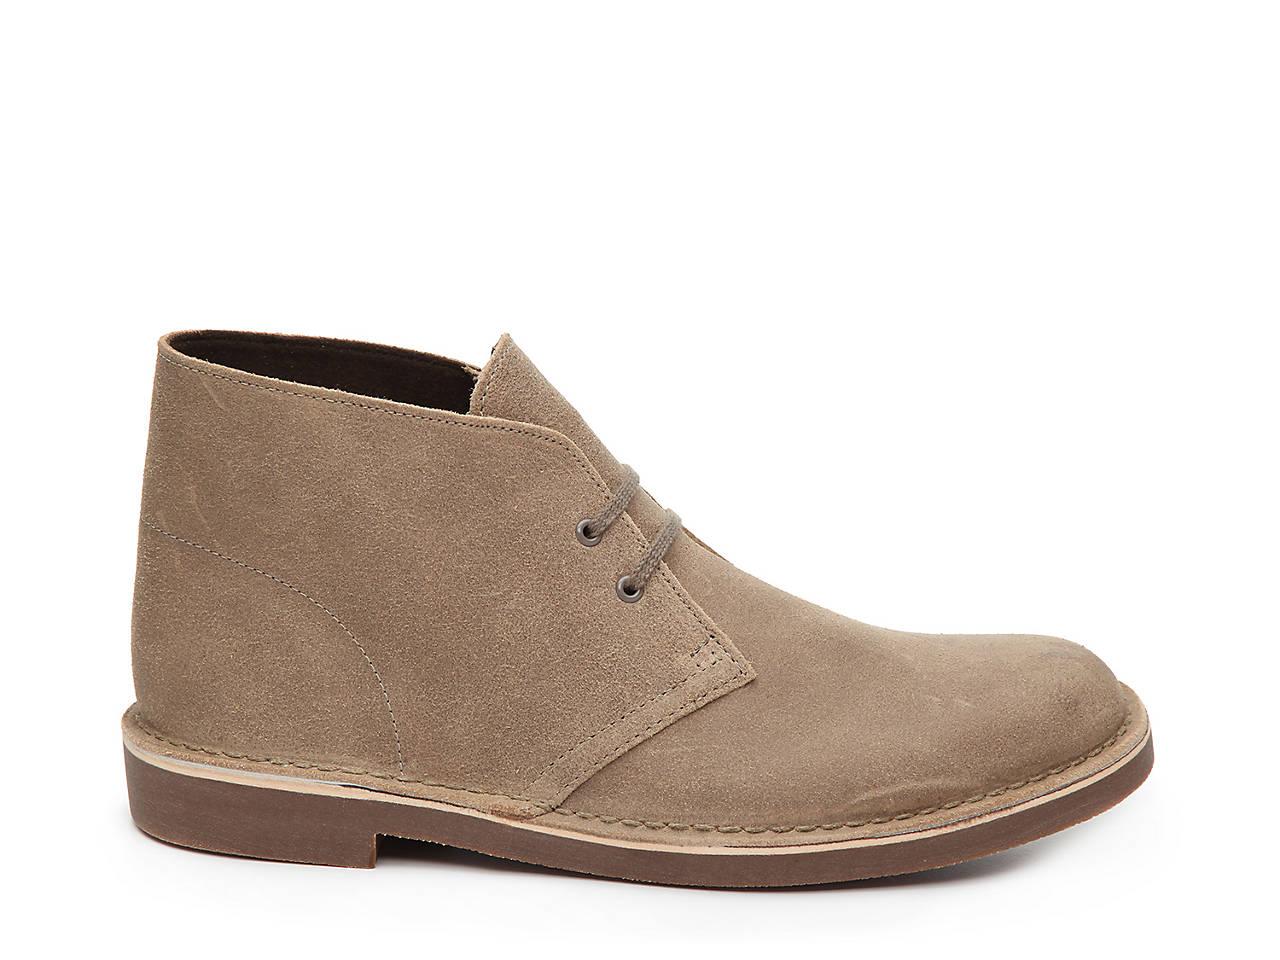 Clarks Men/'s Bushacre 2 Chukka desert Boots Classic Ankle High Shoes